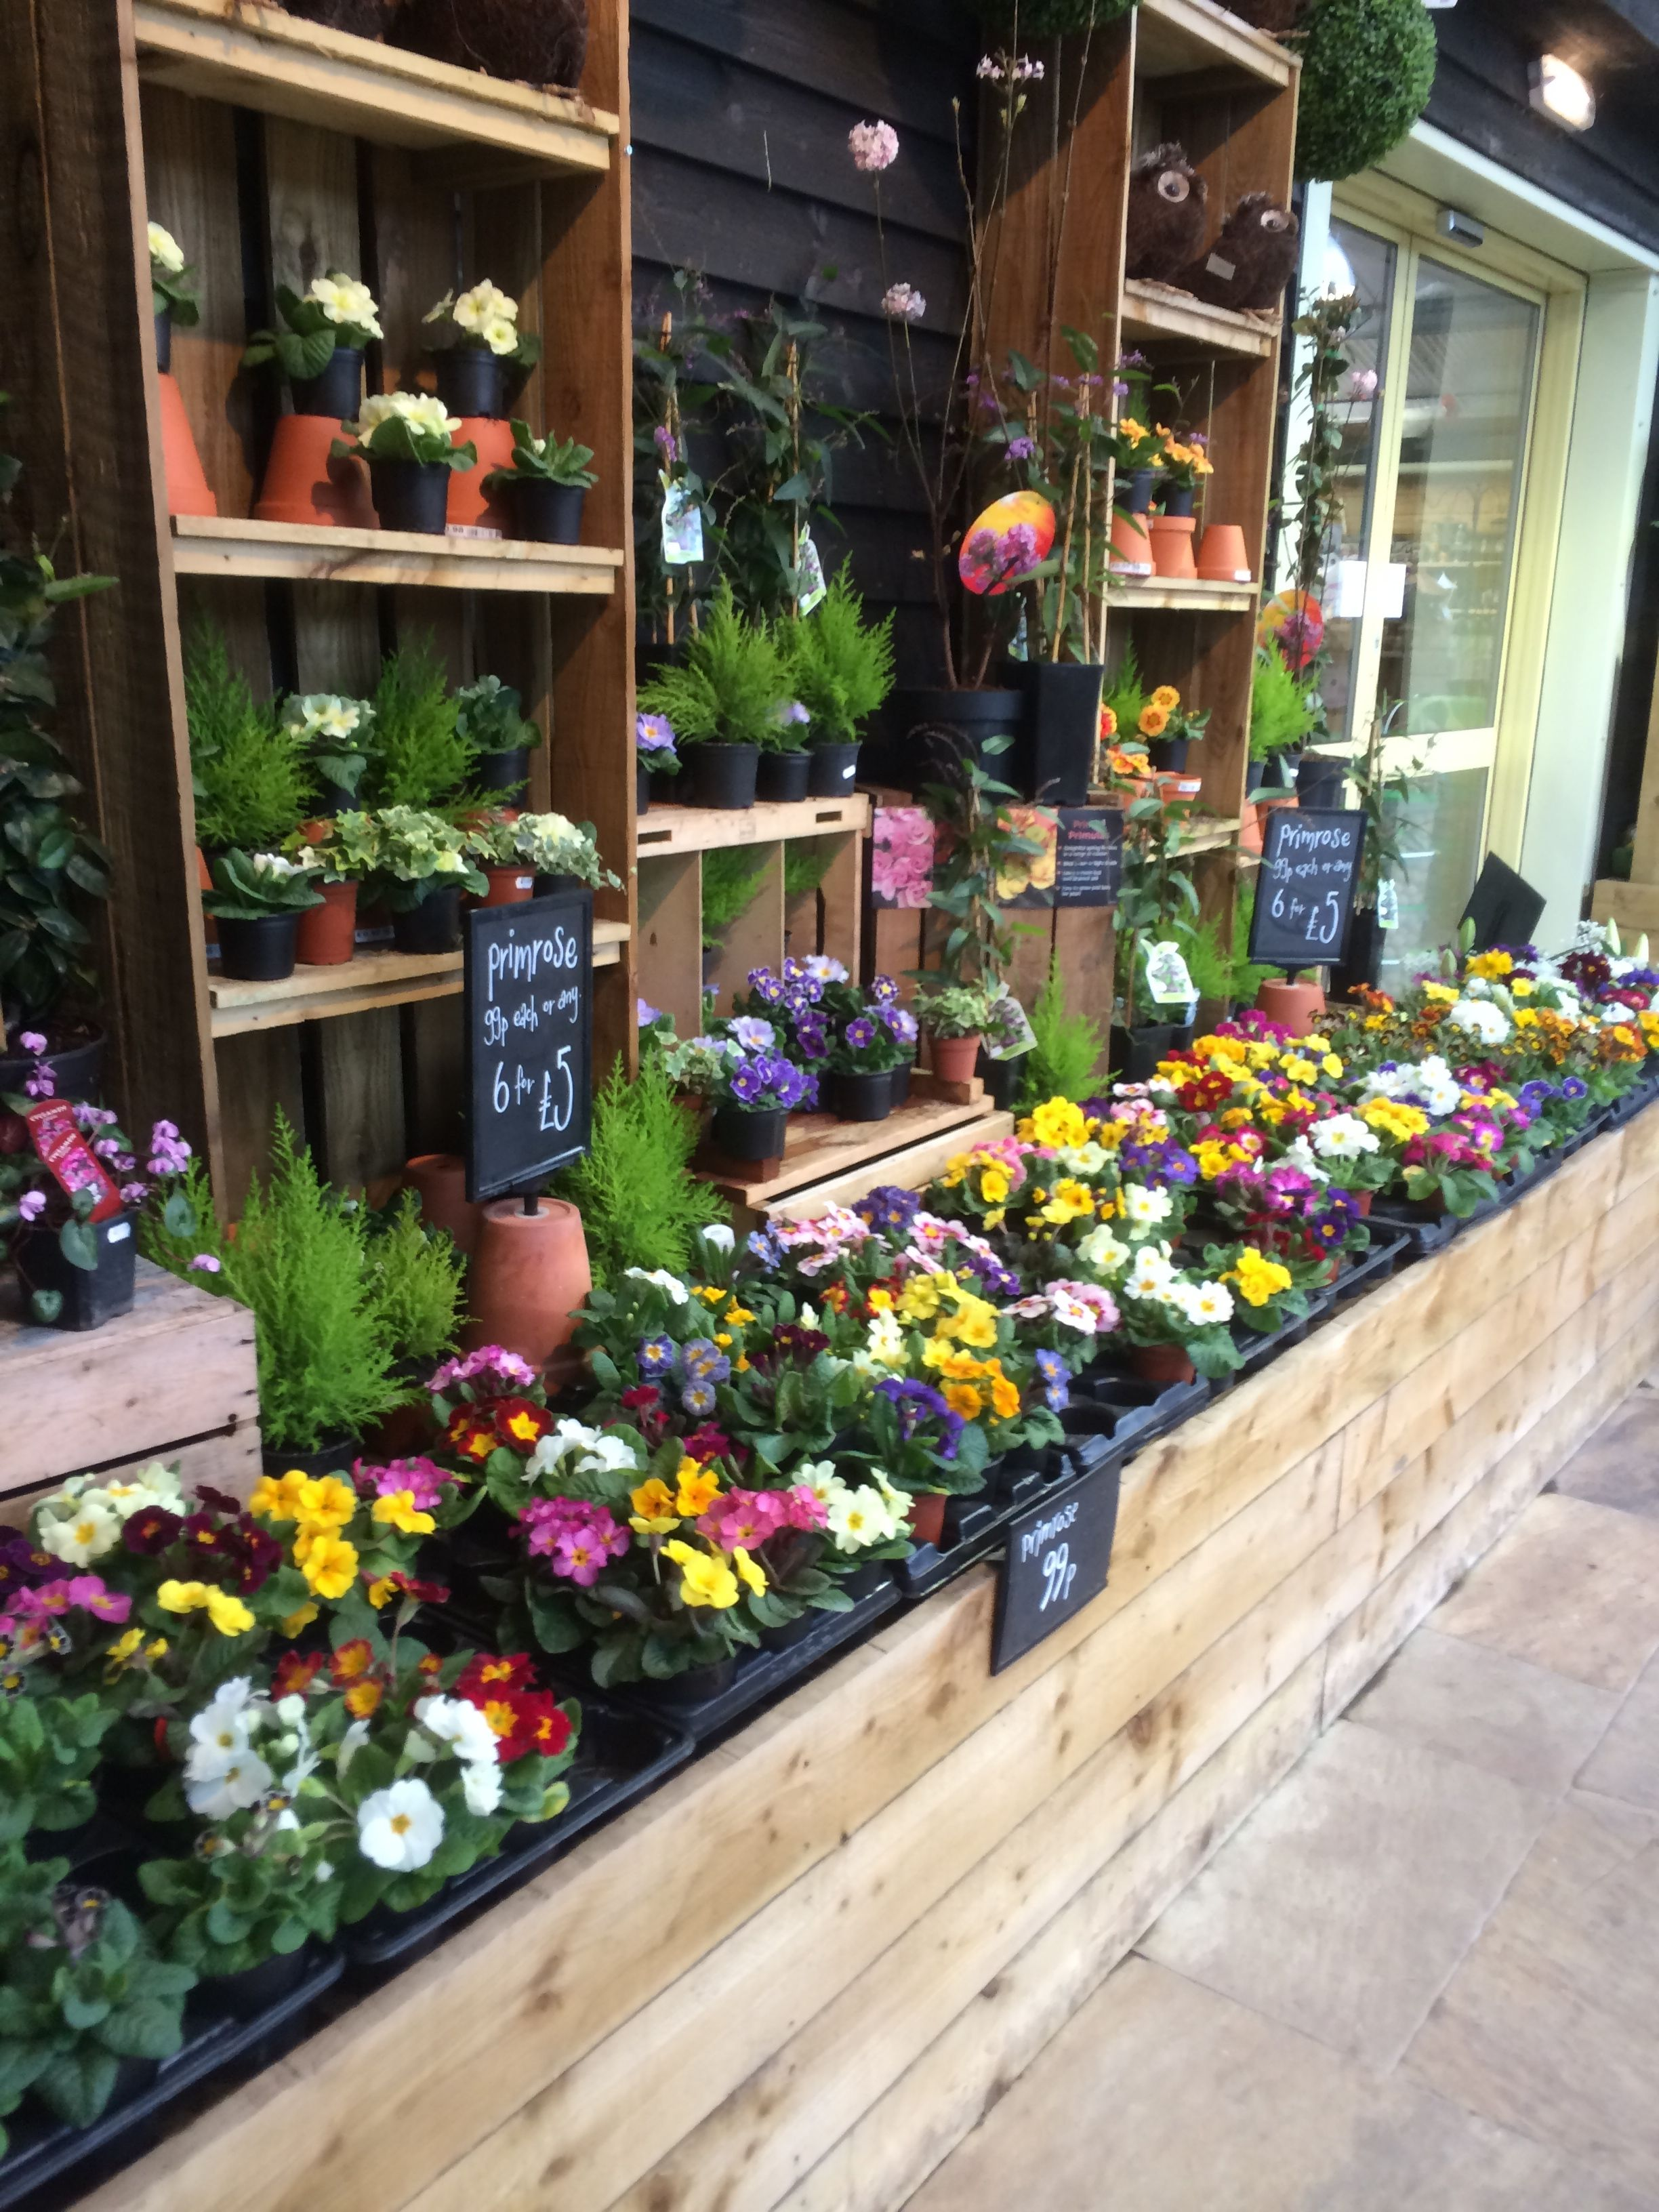 Timmermans Garden Centre Nursery Outdoor Retail Home Lifestyle Plants Visual Merchandising Layout Landscape